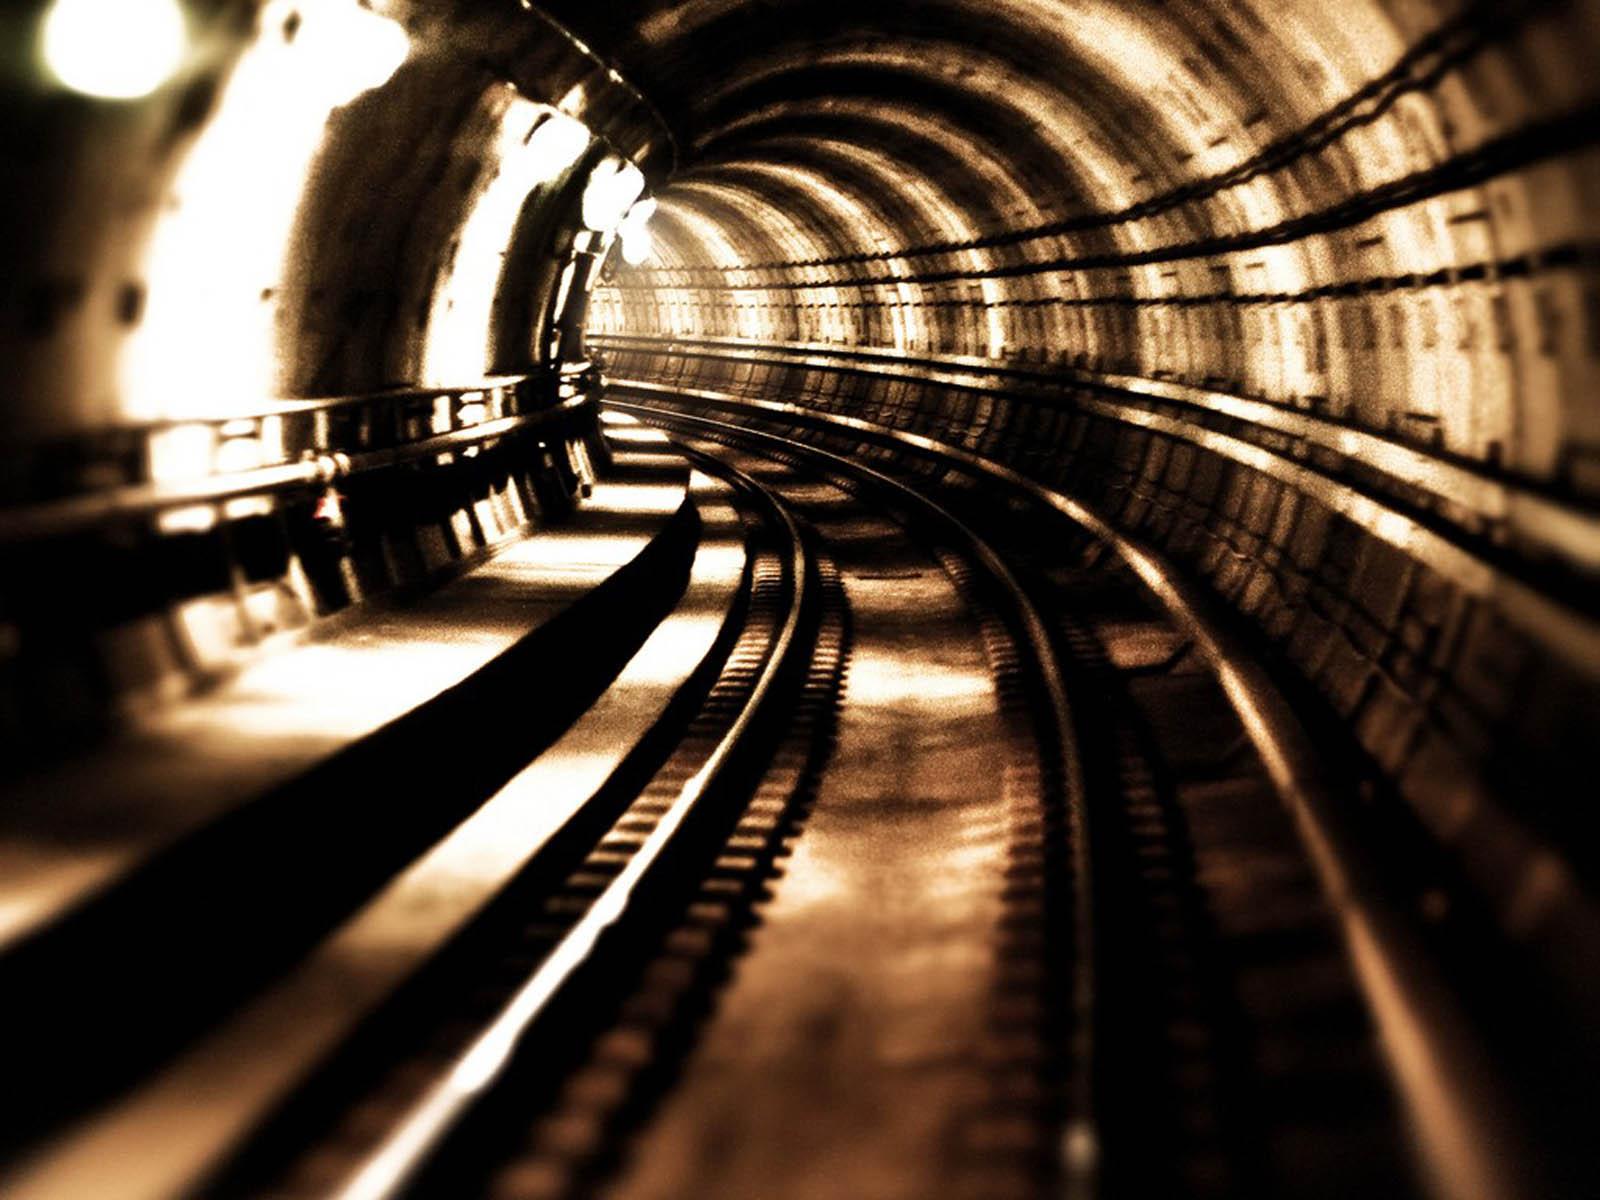 gambar rel kereta api